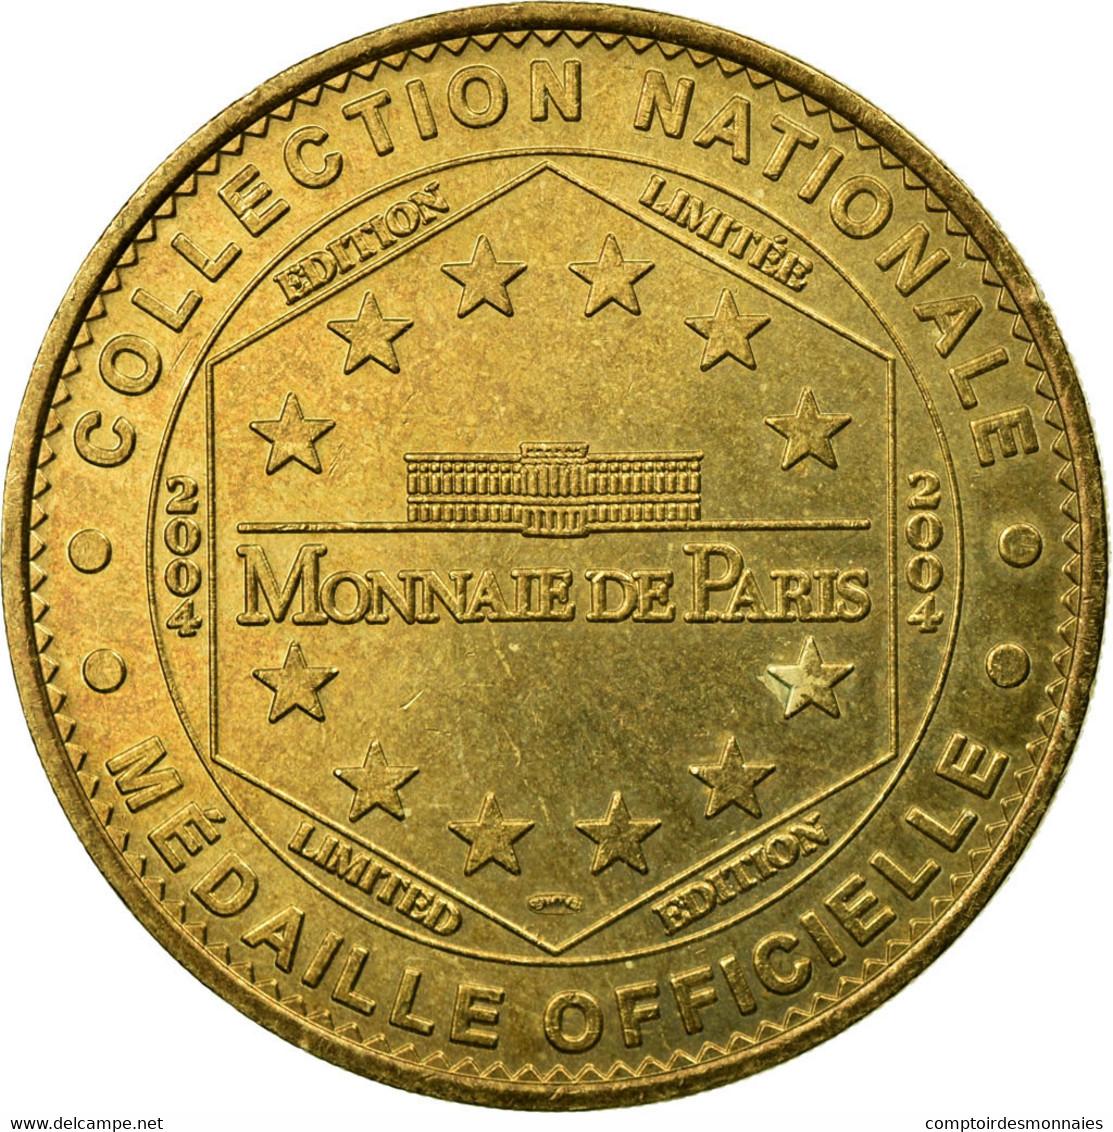 France, Jeton, Orcines - Eglise Romane, 2004, MDP, TTB, Cupro-nickel Aluminium - France